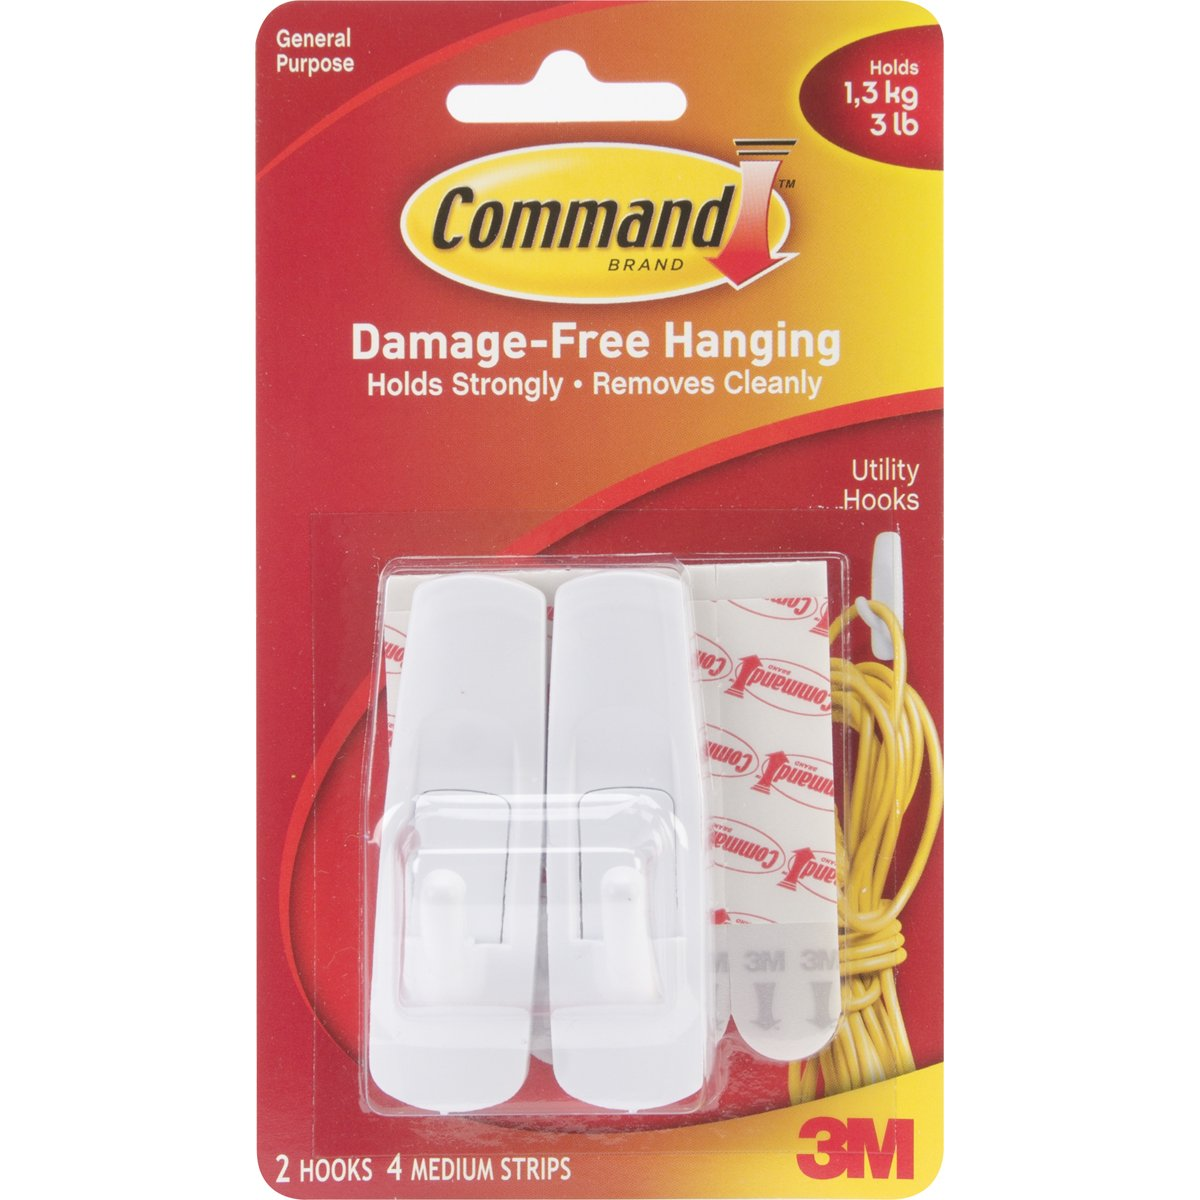 Command Utility Hooks Value Pack, Medium, White, 6-Hooks (17001-6ES) 3M 17001-VP-6PK